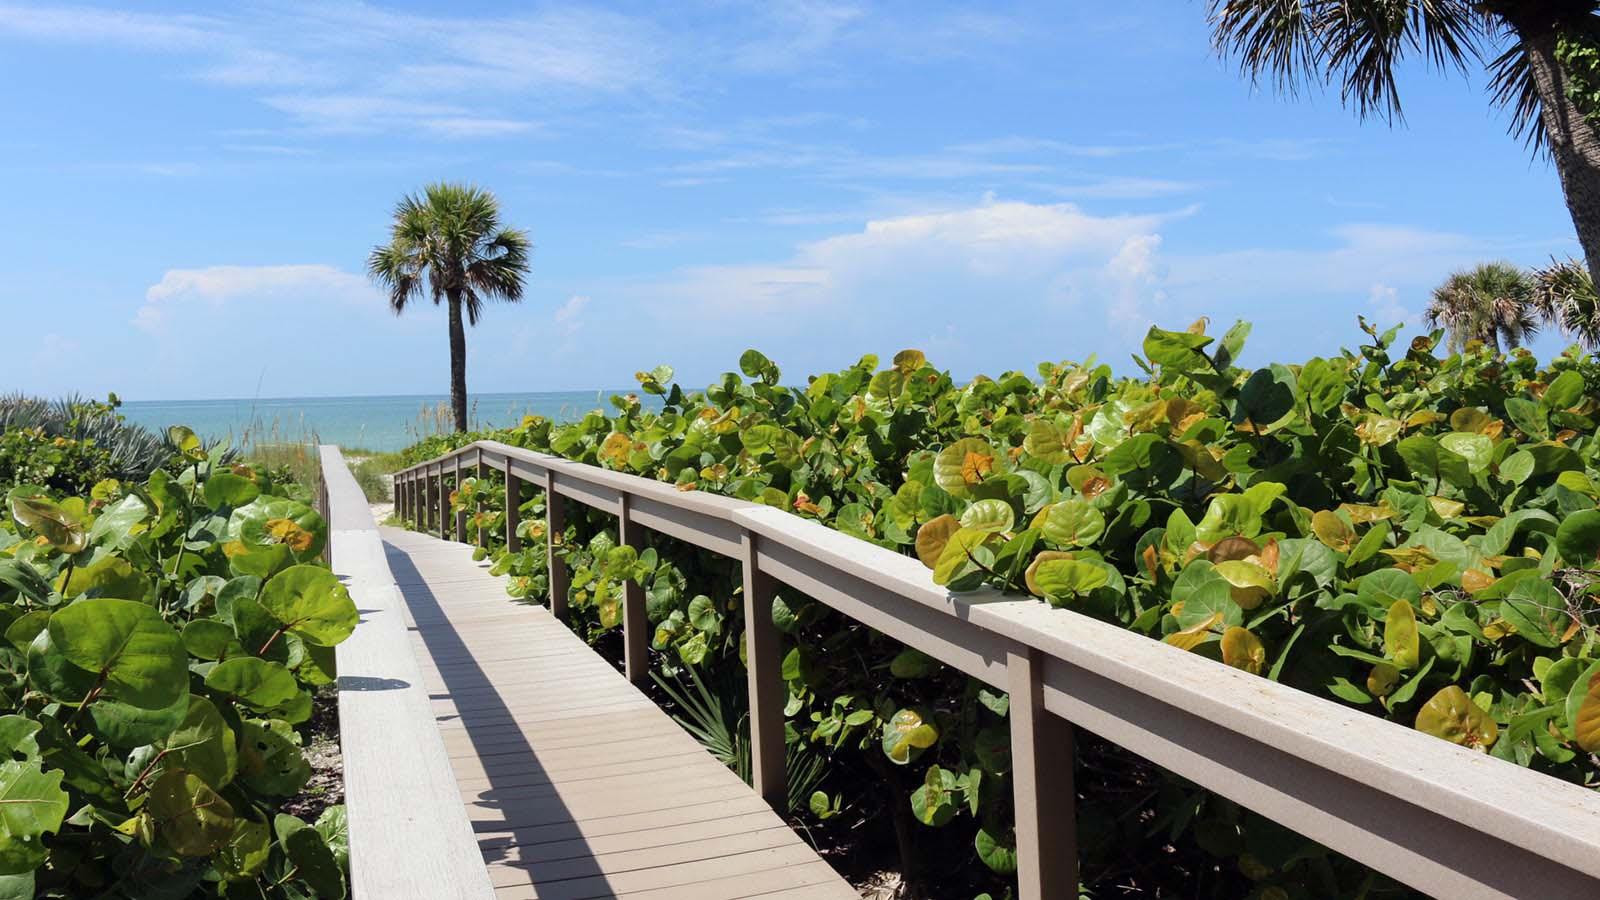 sanibel condo rentals poinciana boardwalk island vacations of sanibel captiva. Black Bedroom Furniture Sets. Home Design Ideas